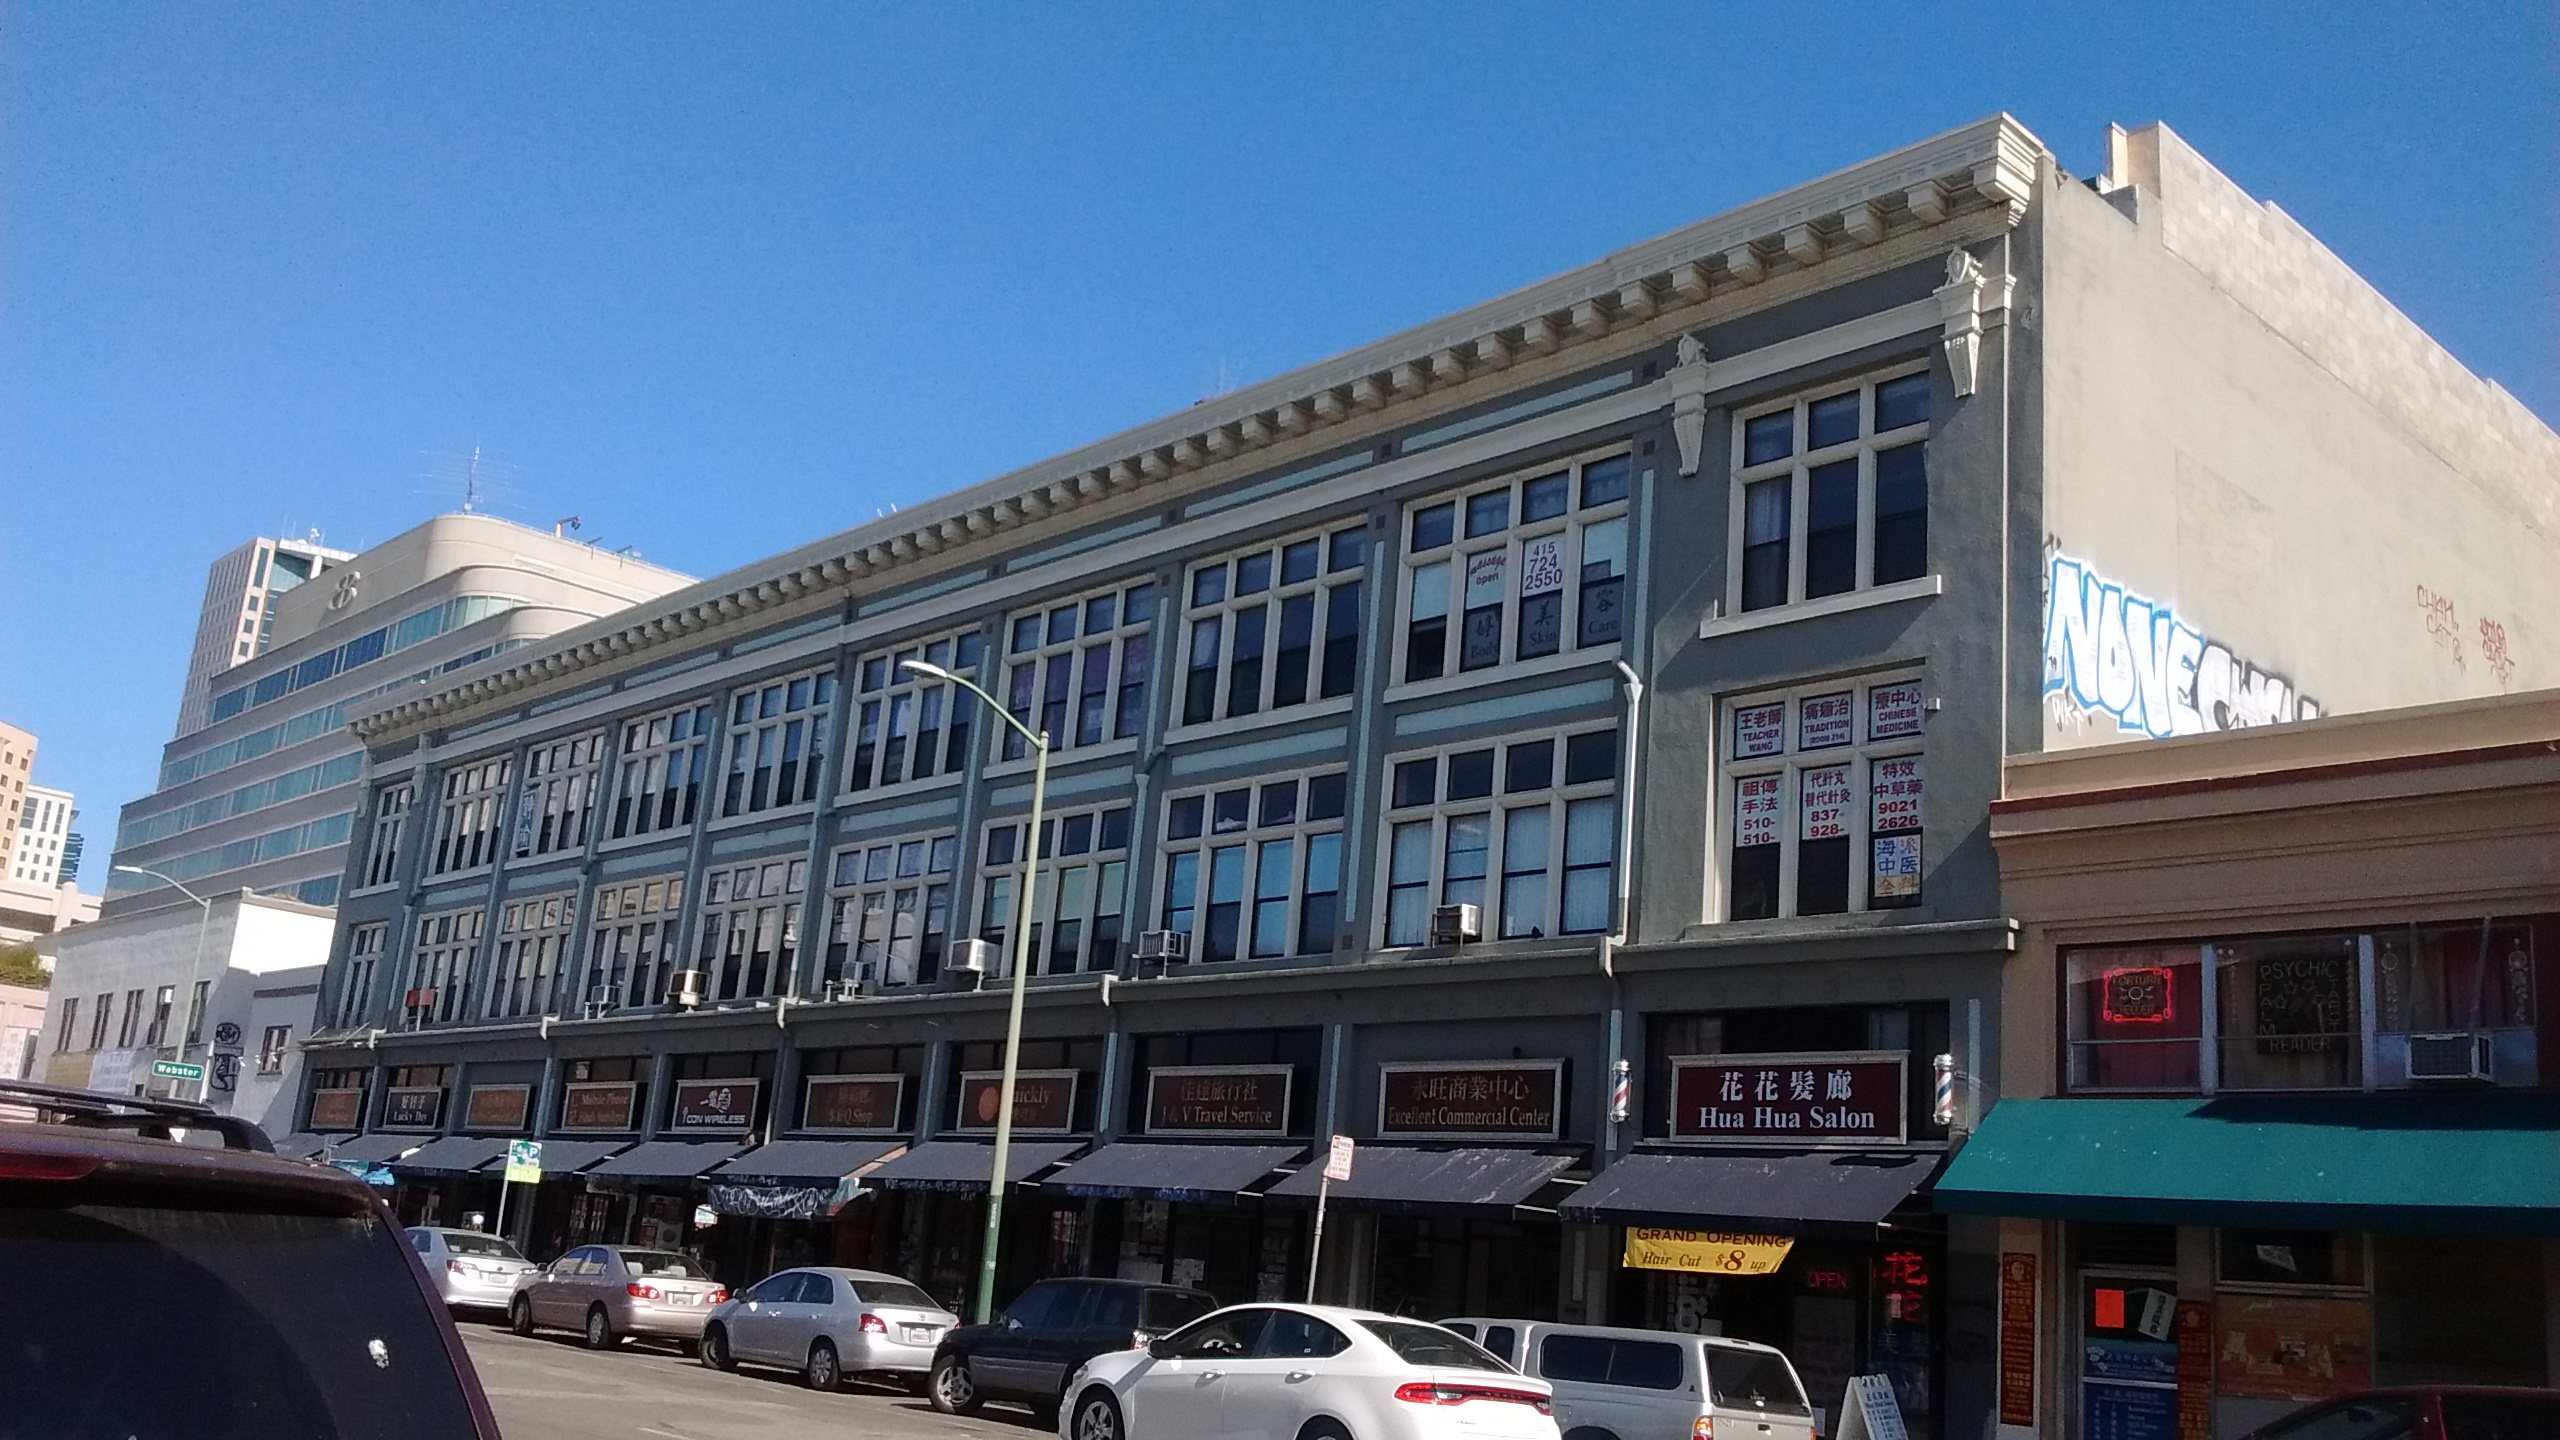 320-328 10th St., Oakland, California 94607